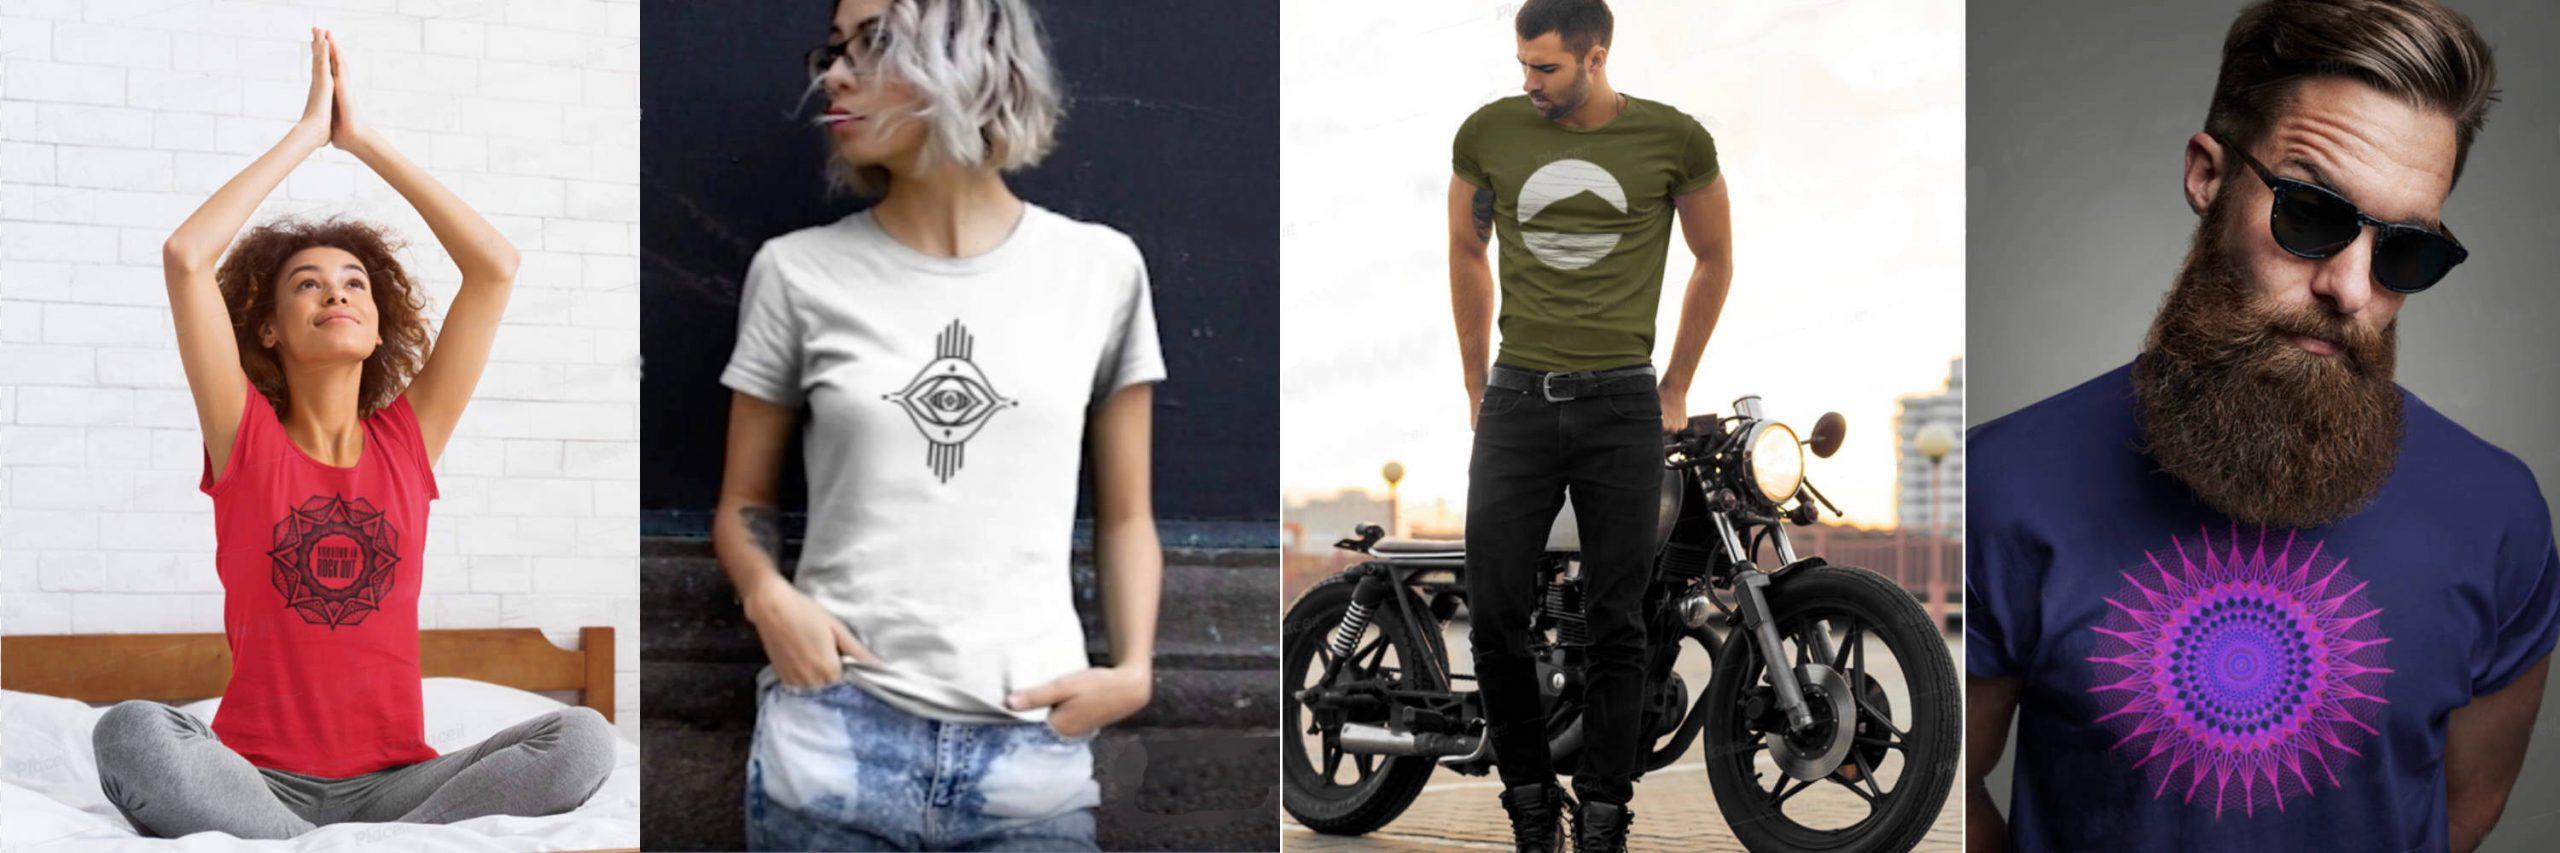 Universe All Mandala Art designs tshirts yoga tops men tee women unisex